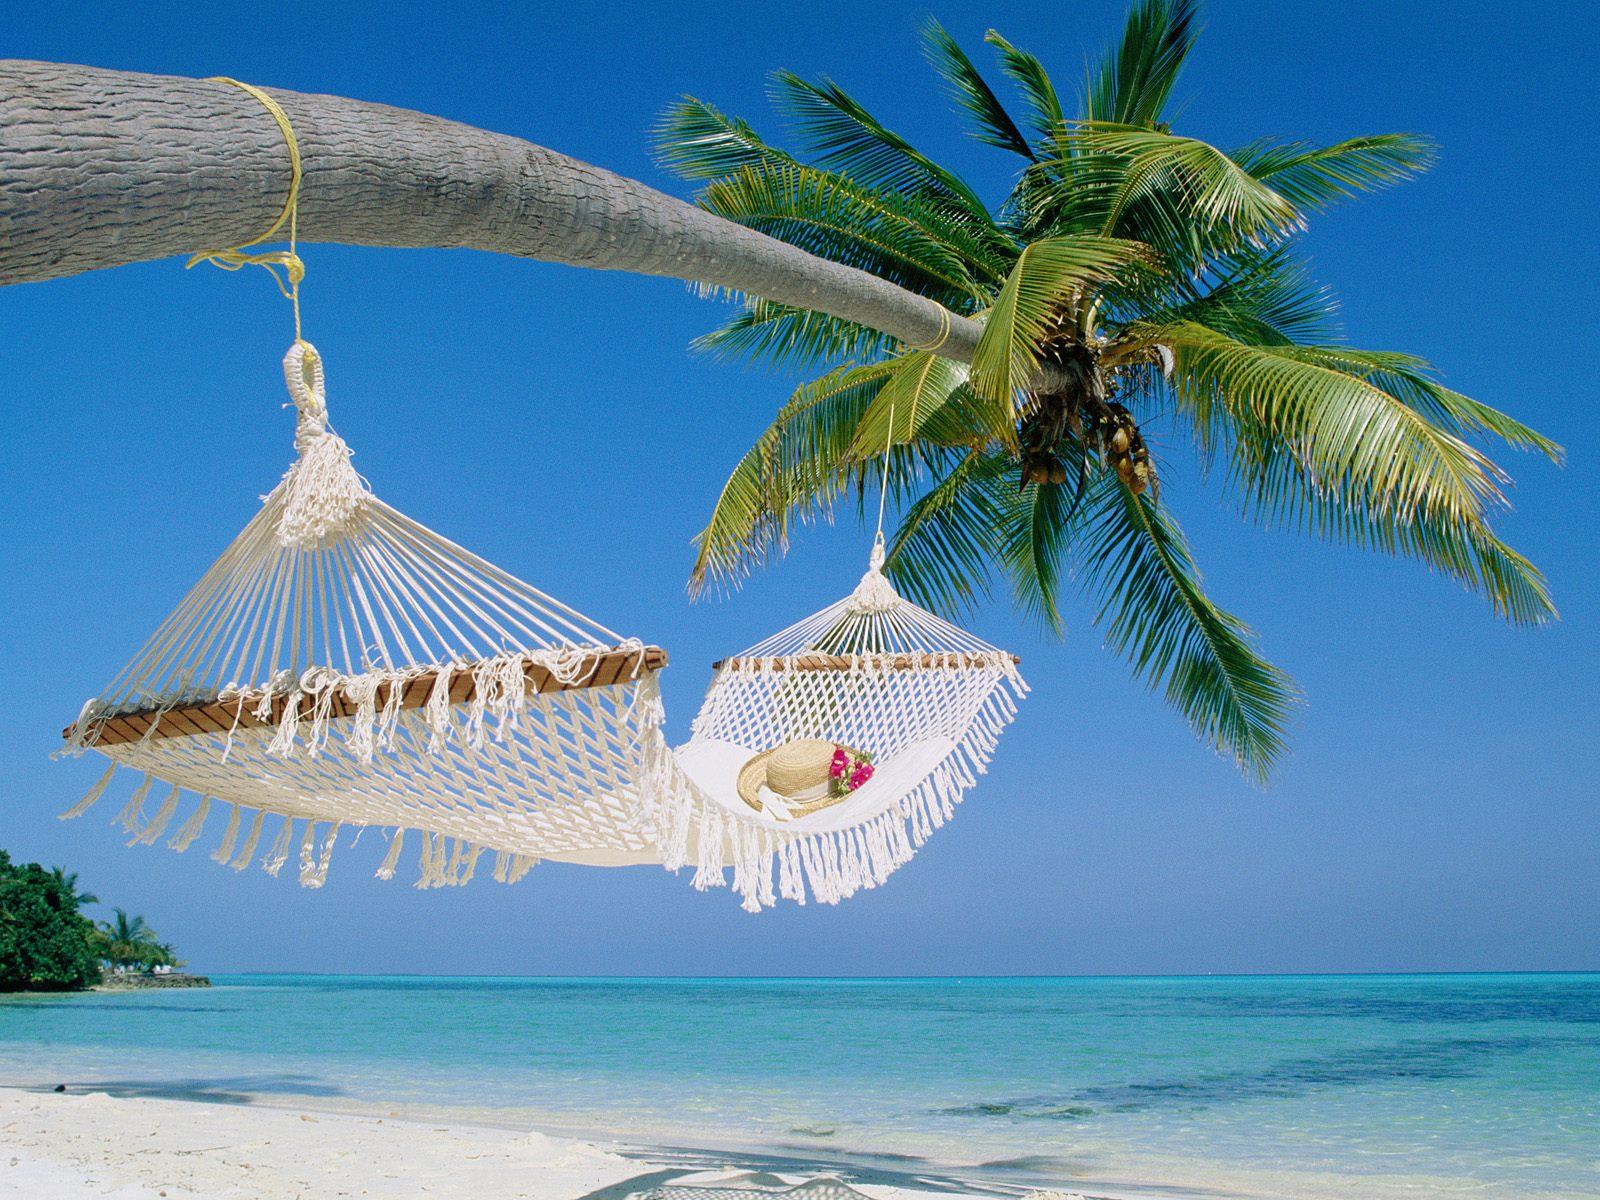 http://1.bp.blogspot.com/_velMS0My2NU/TK6wfmJlIlI/AAAAAAAAAAc/vO8rTOcTUwo/s1600/Maldives.jpg